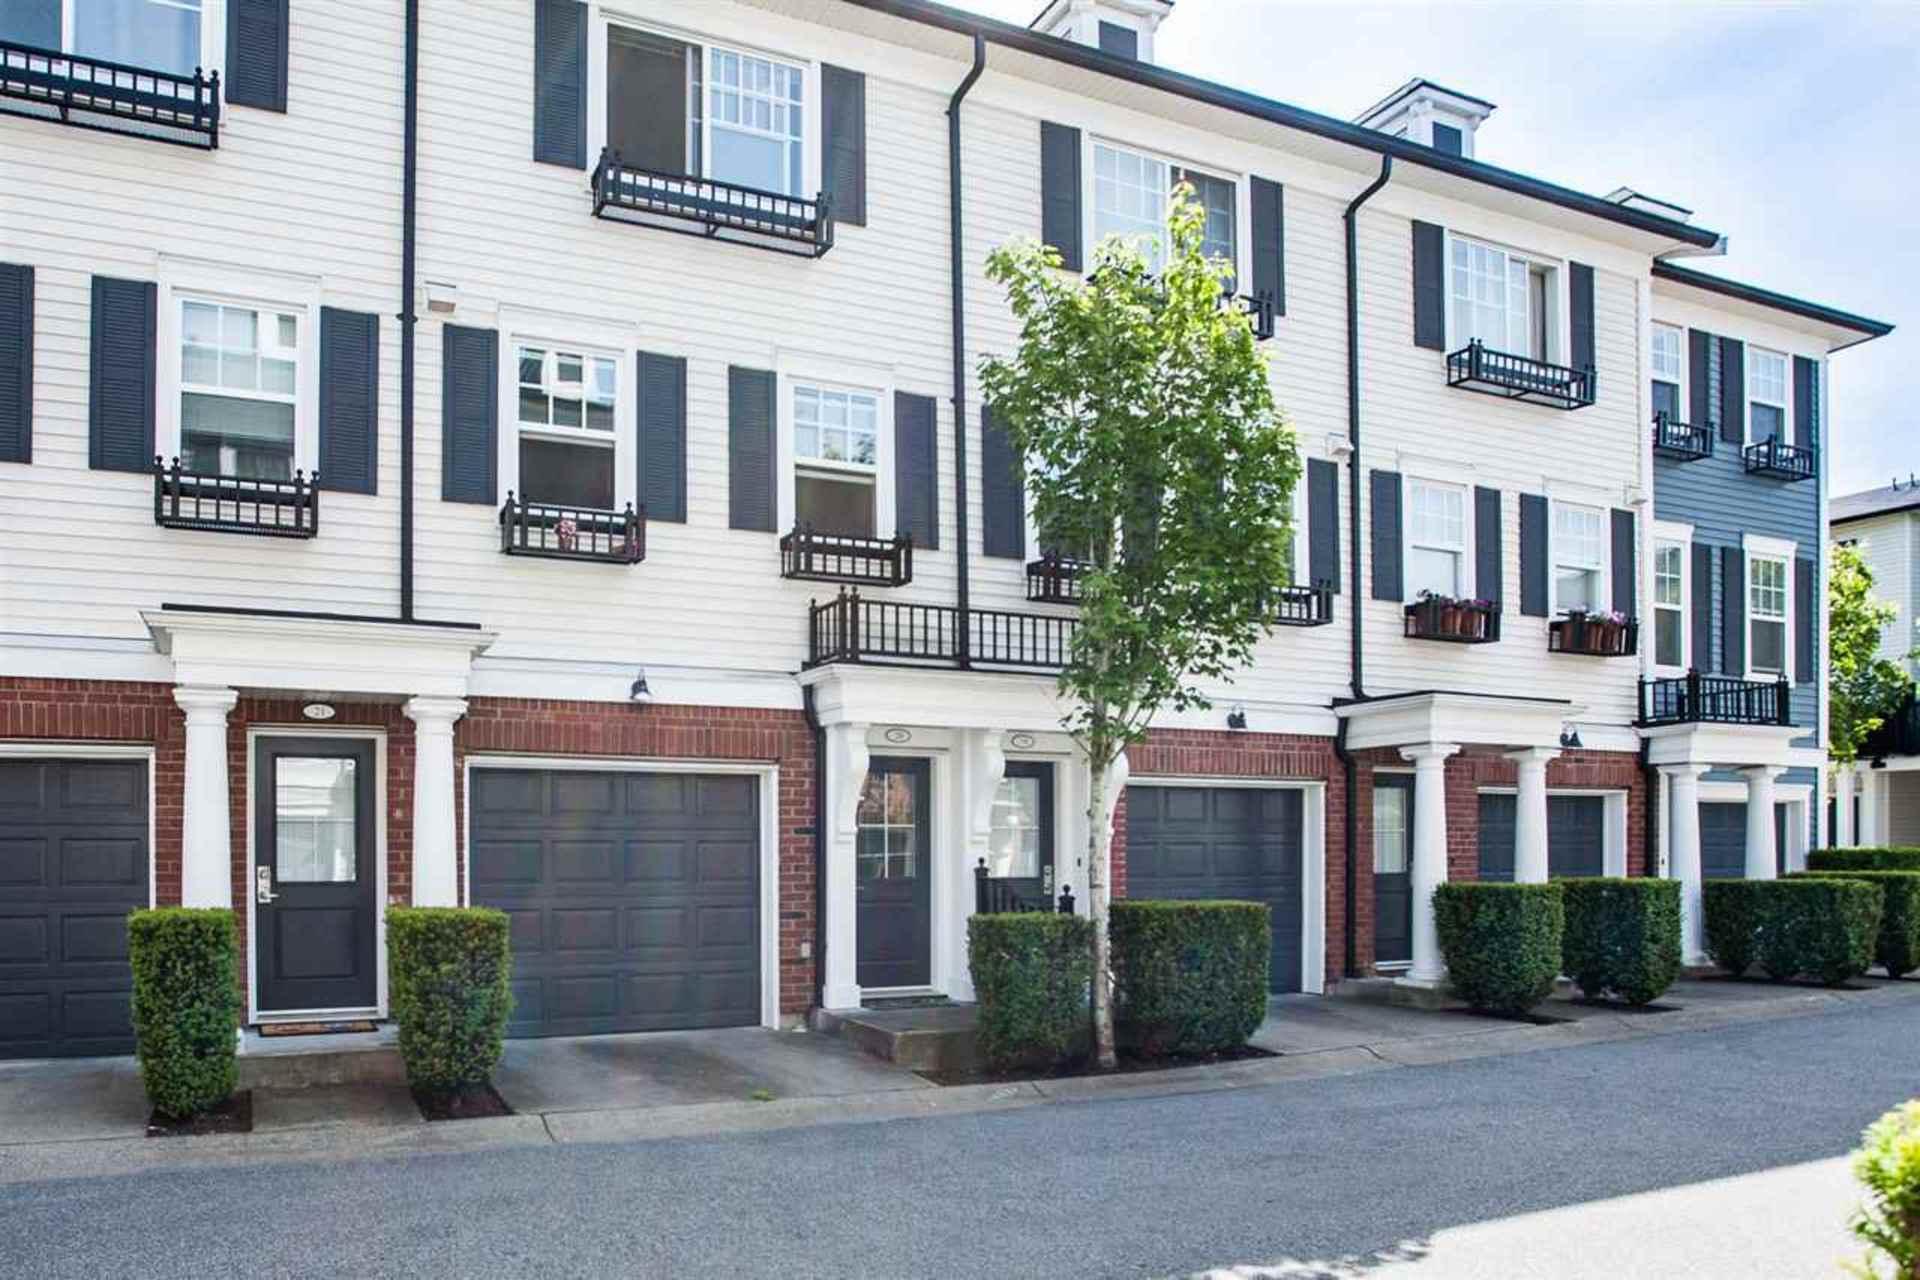 18983-72a-avenue-clayton-cloverdale-02 at 20 - 18983 72a Avenue, Clayton, Cloverdale